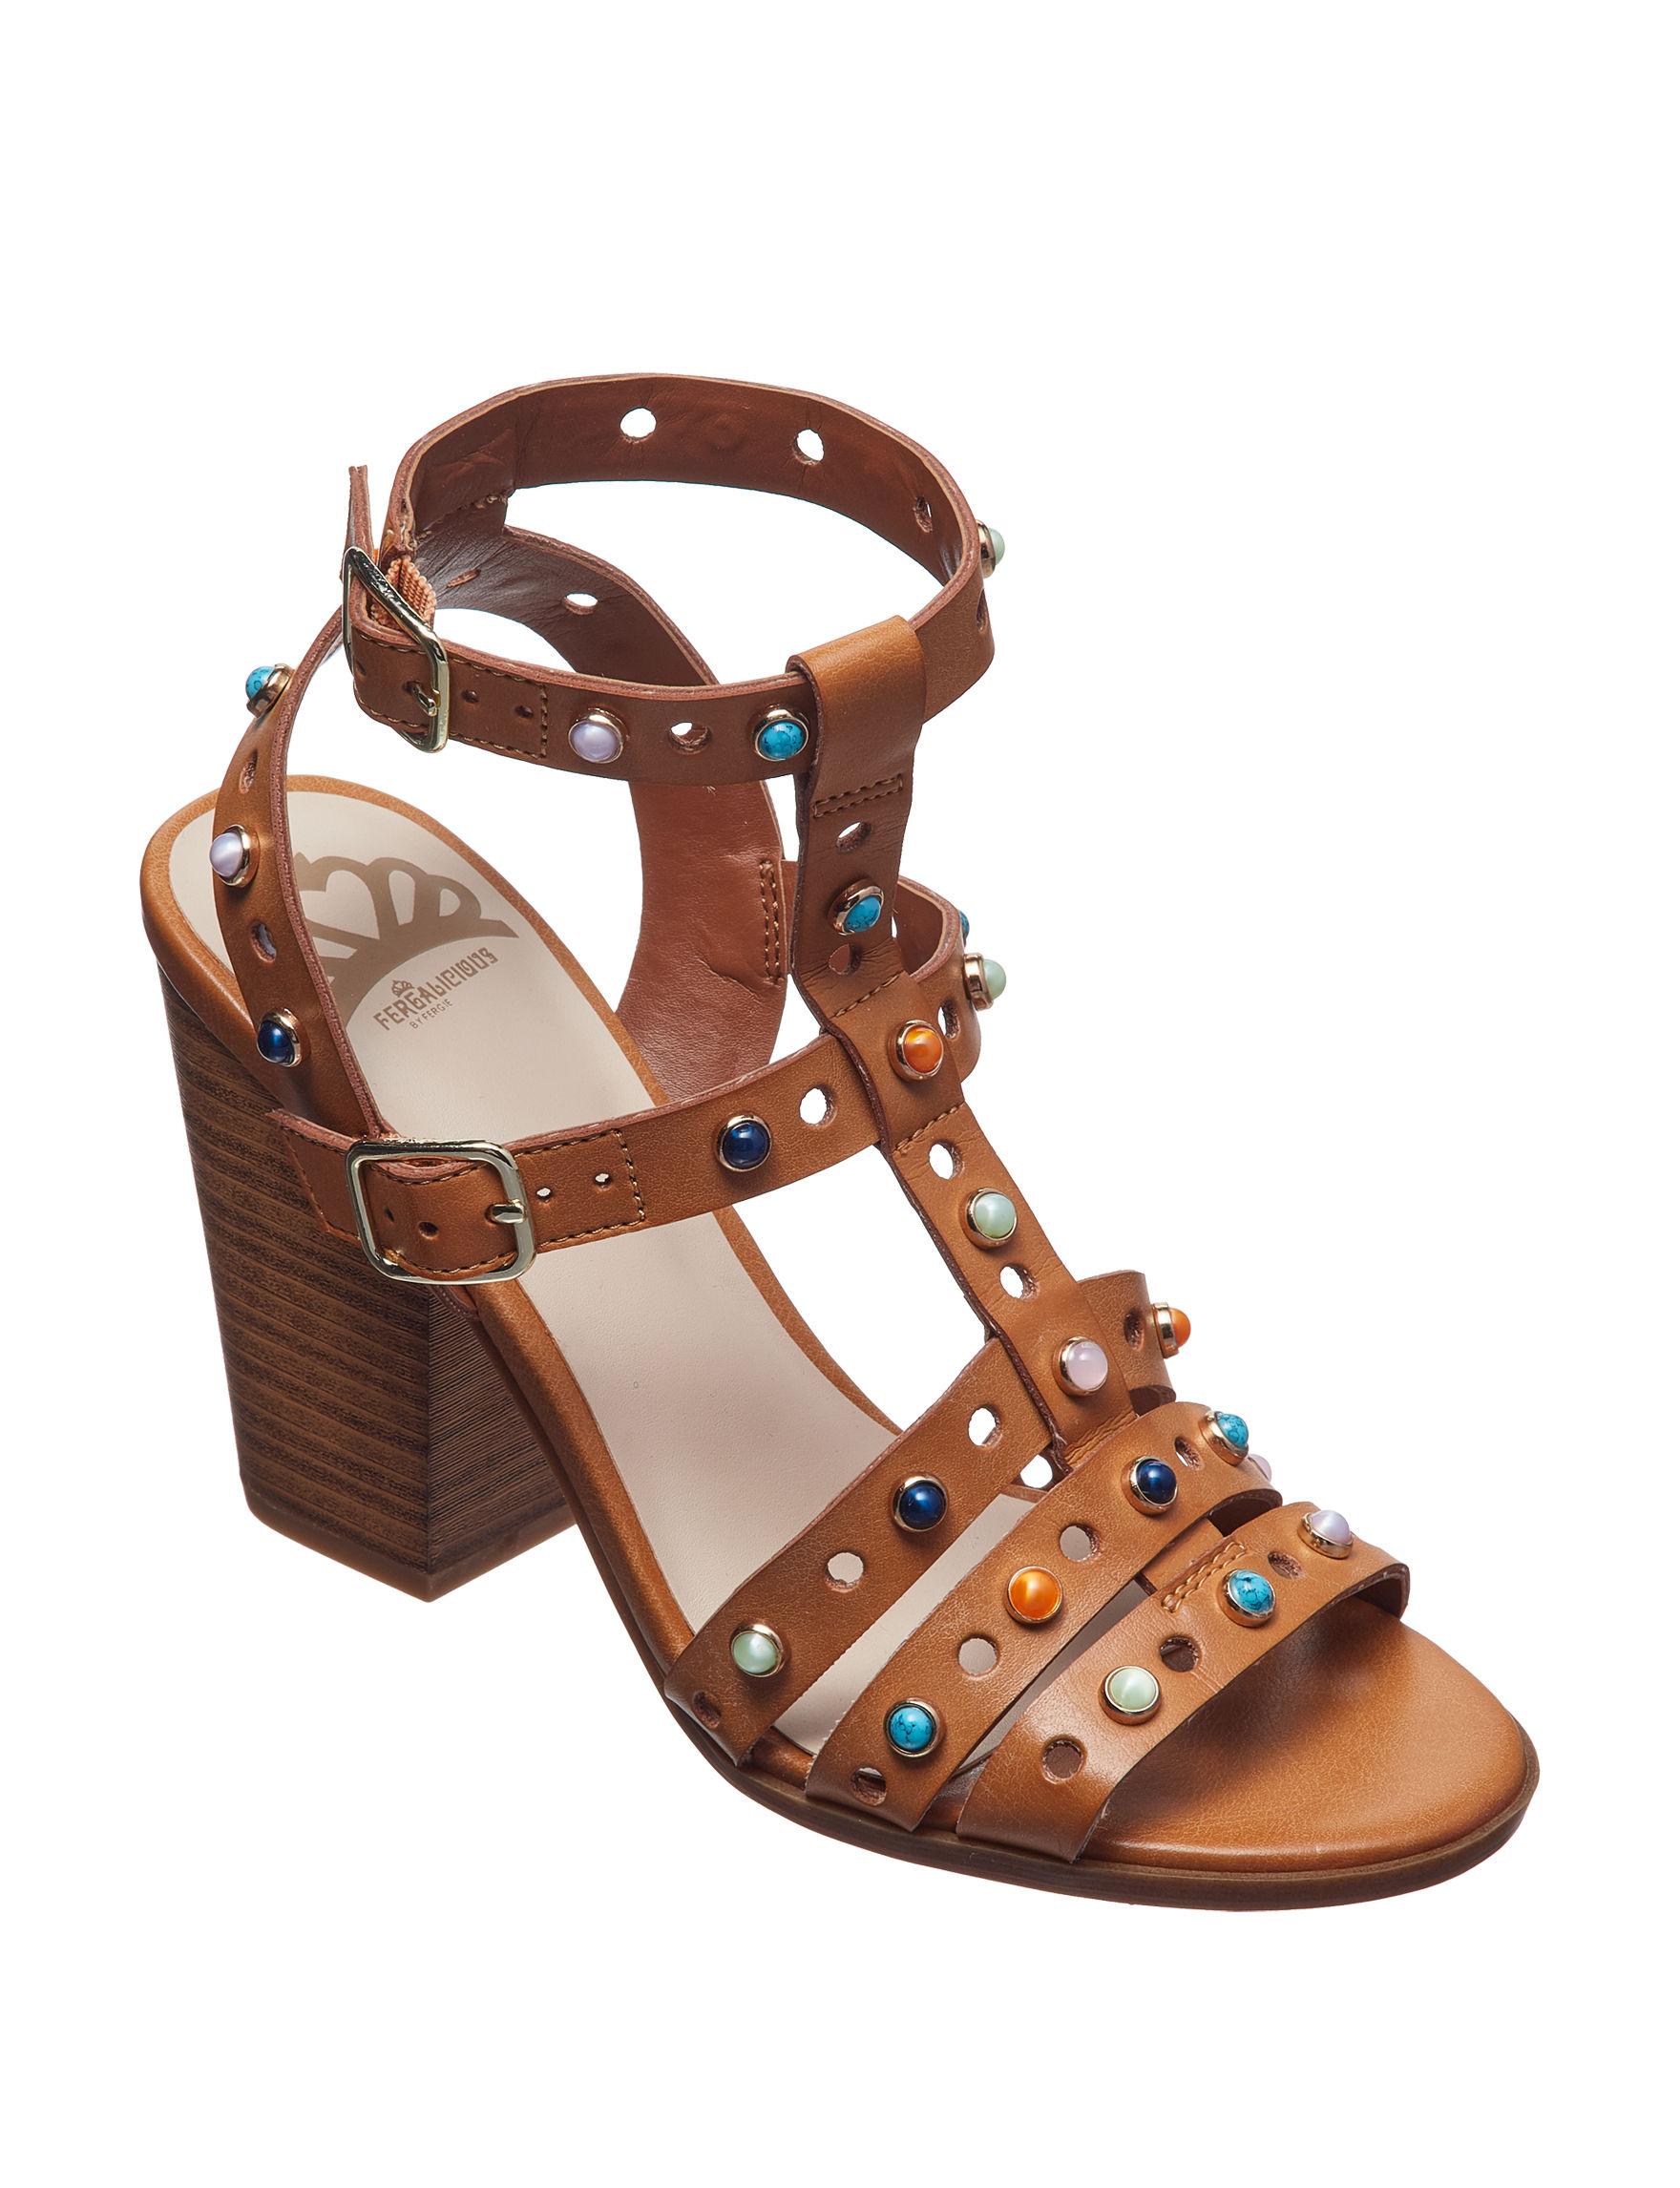 Fergalicious by Fergie Tan Heeled Sandals